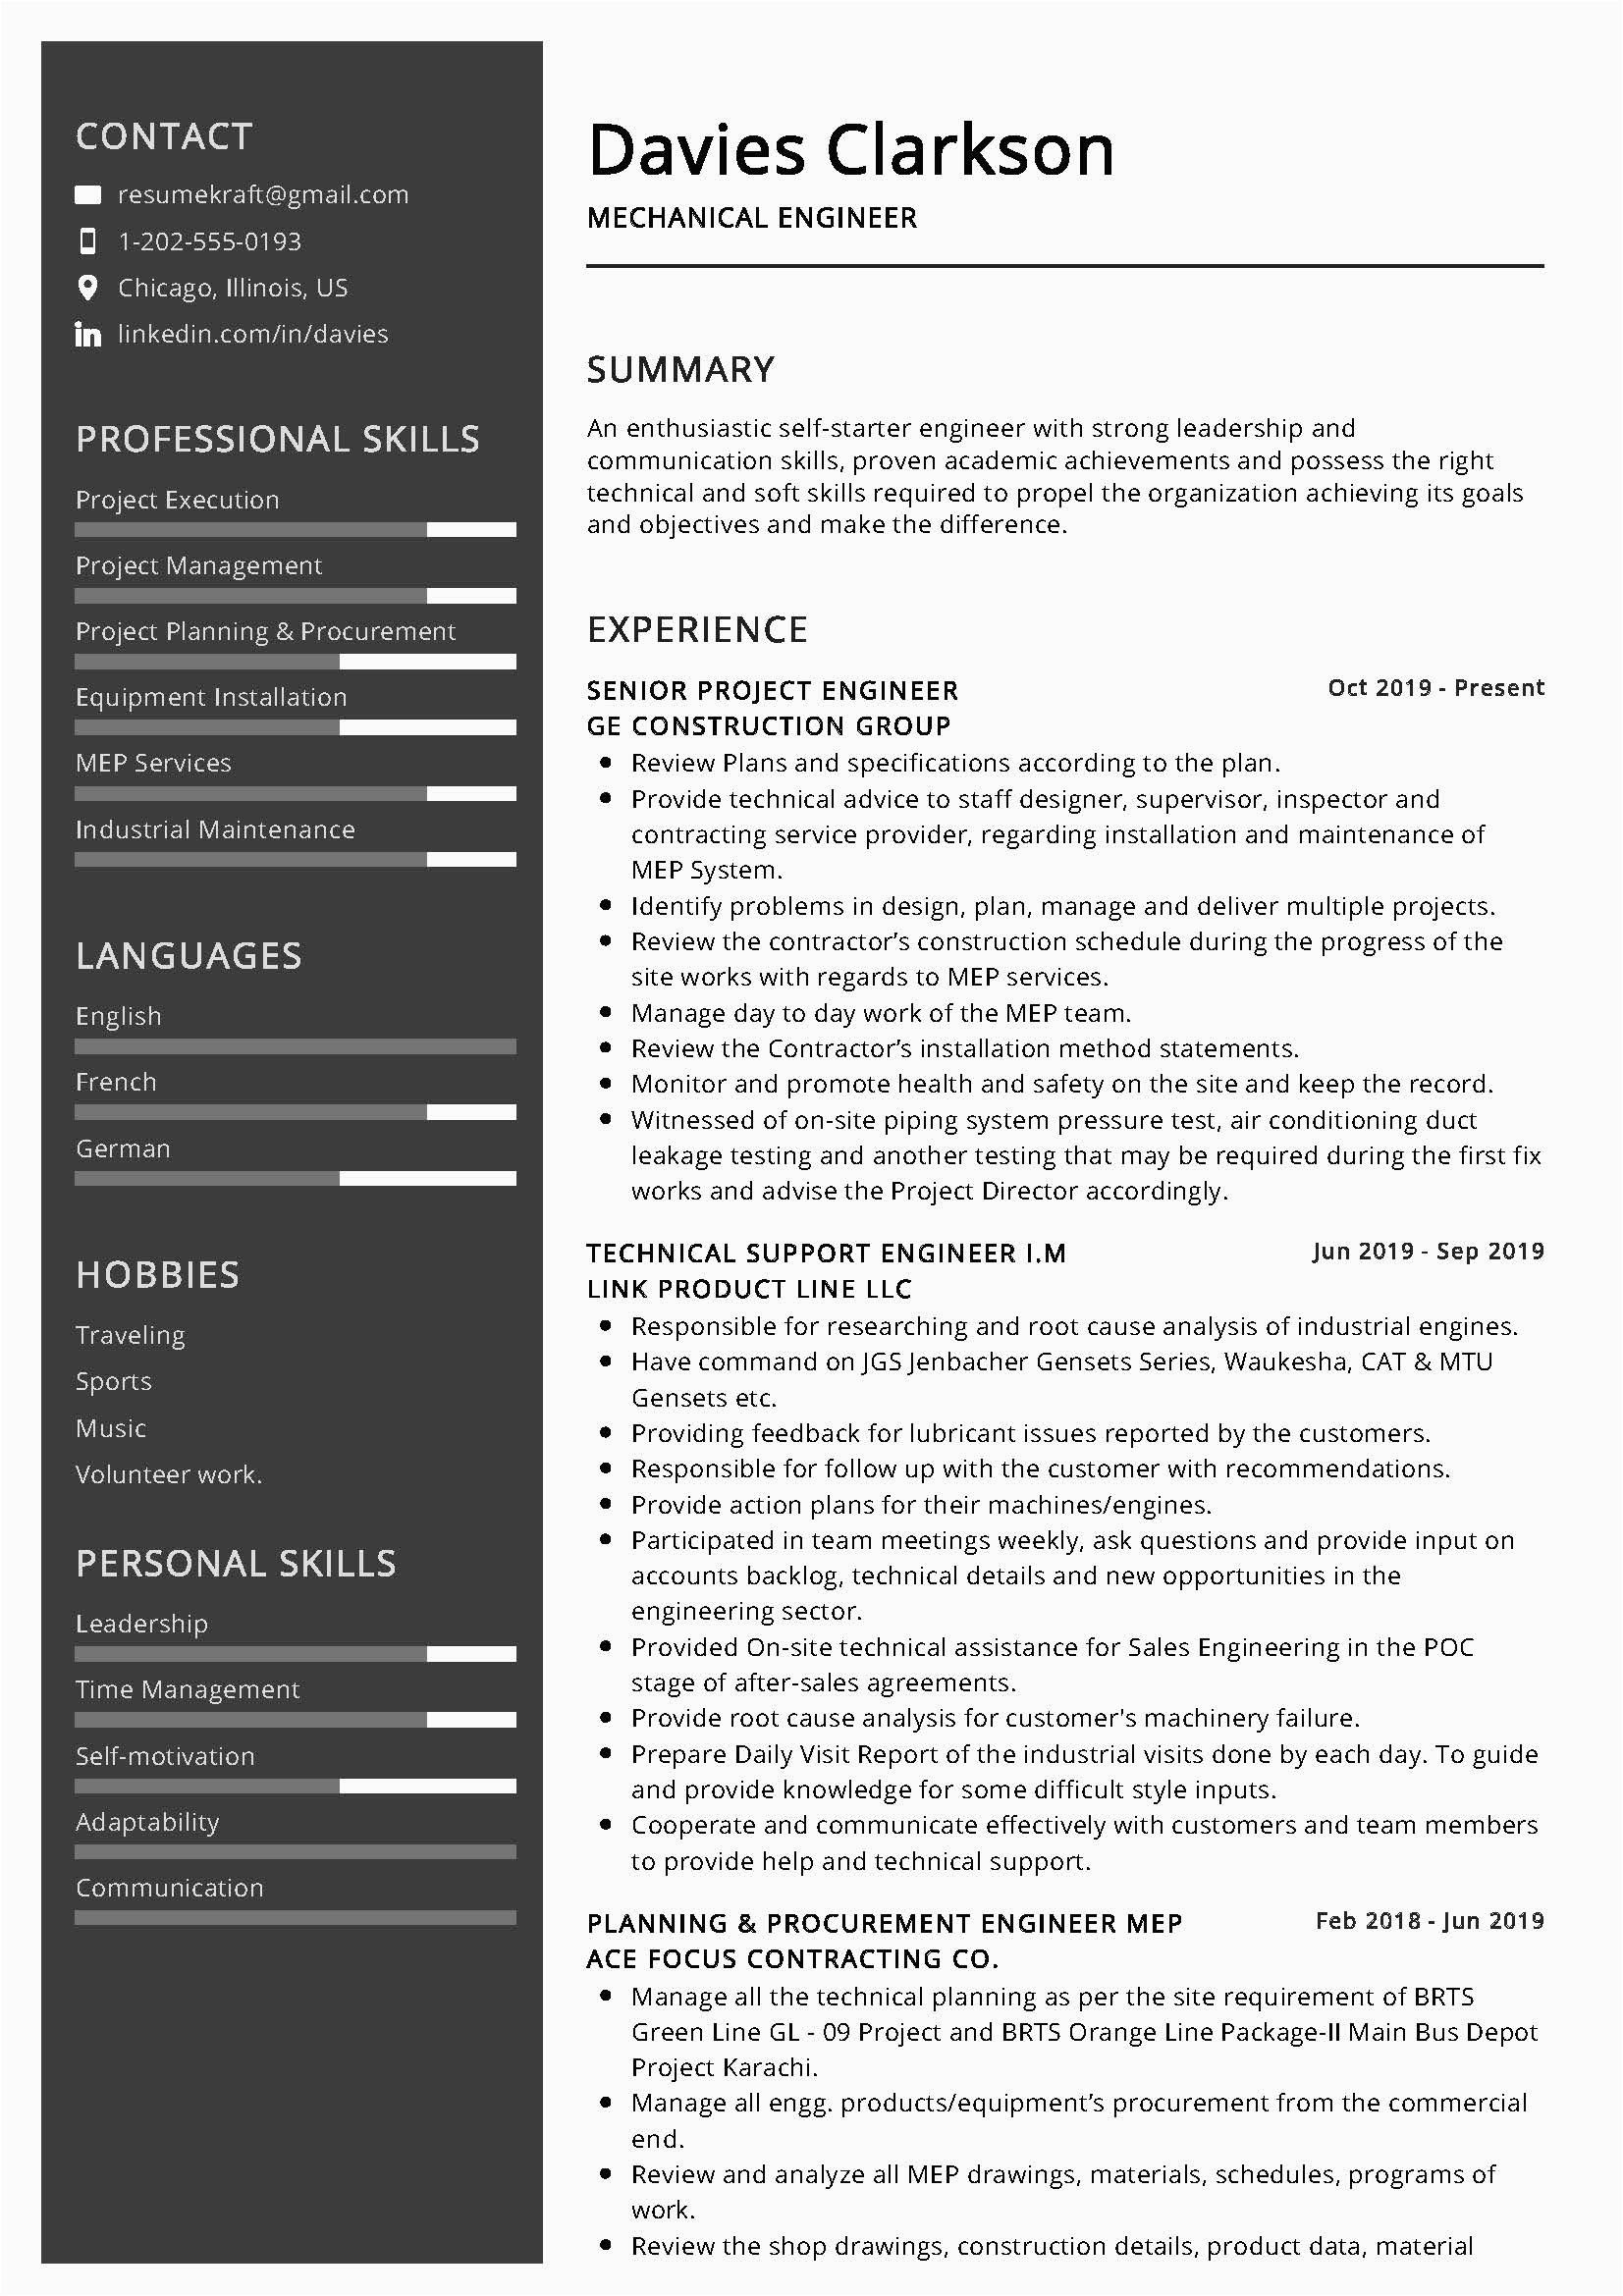 Sample Resume for Mechanical Engineer Professional Mechanical Engineer Resume Sample & Writing Tips 2020